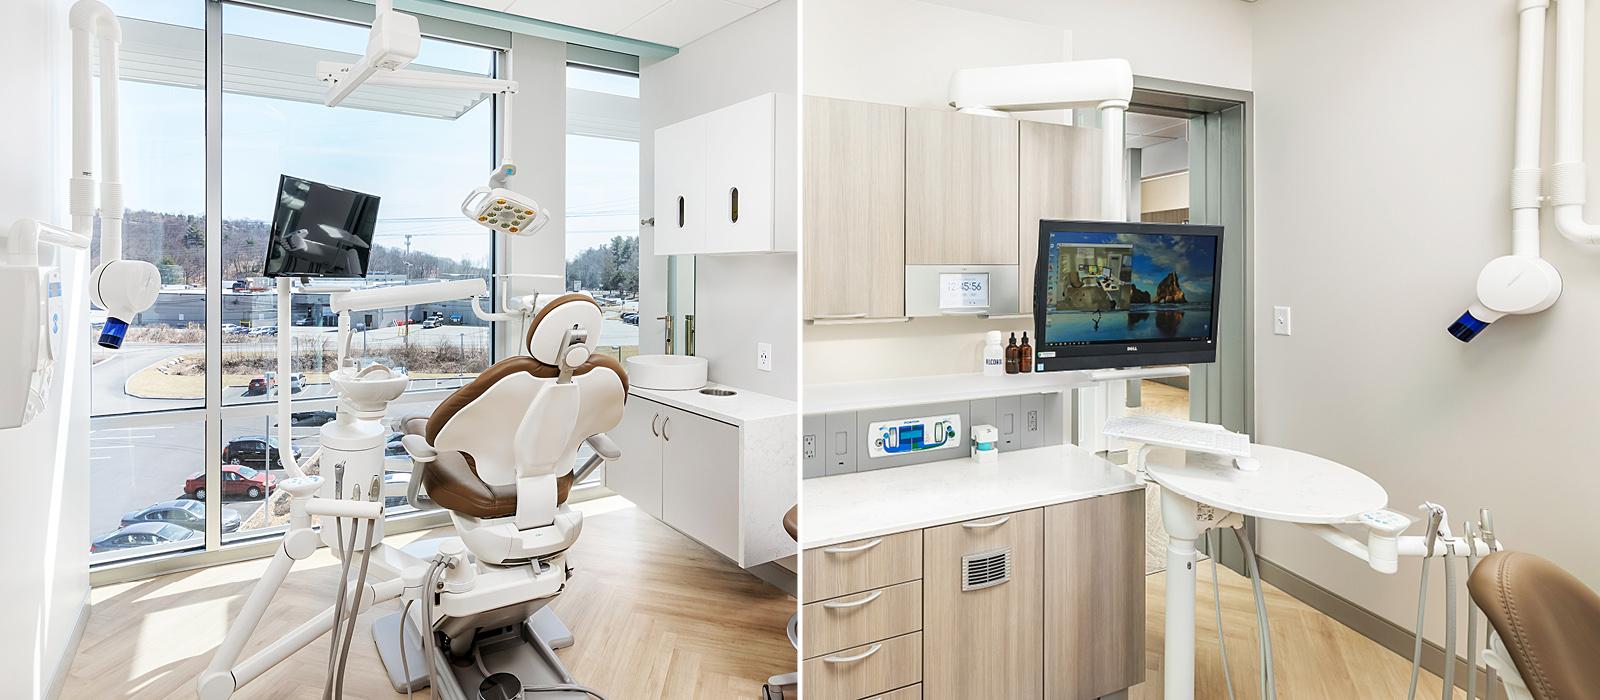 Nova Dental treatment area